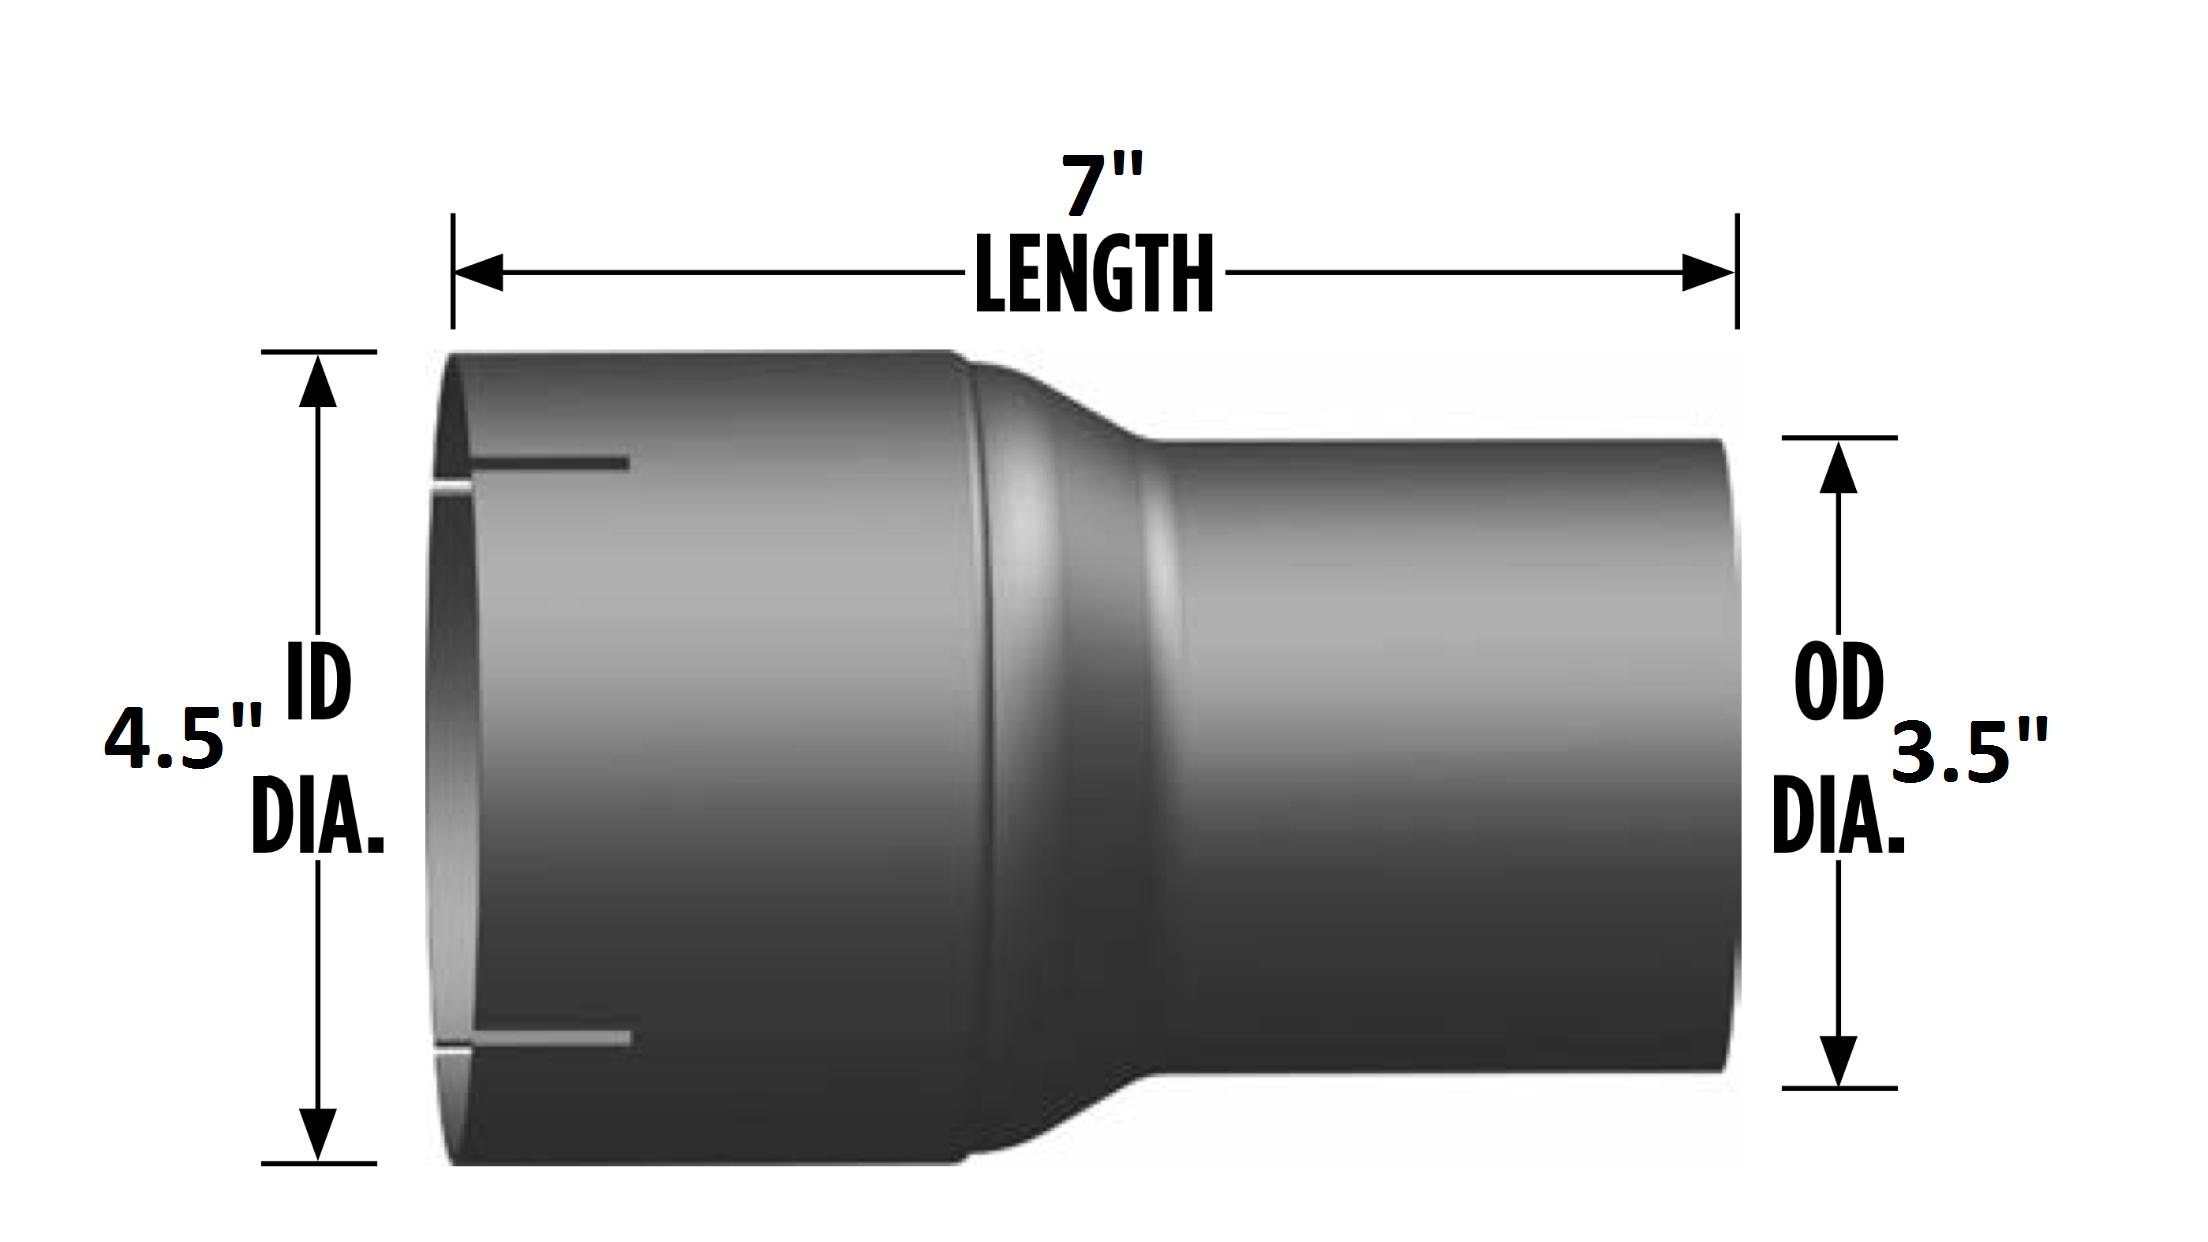 3 5 4 5 o d i d expander exhaust pipe coupler 7 length